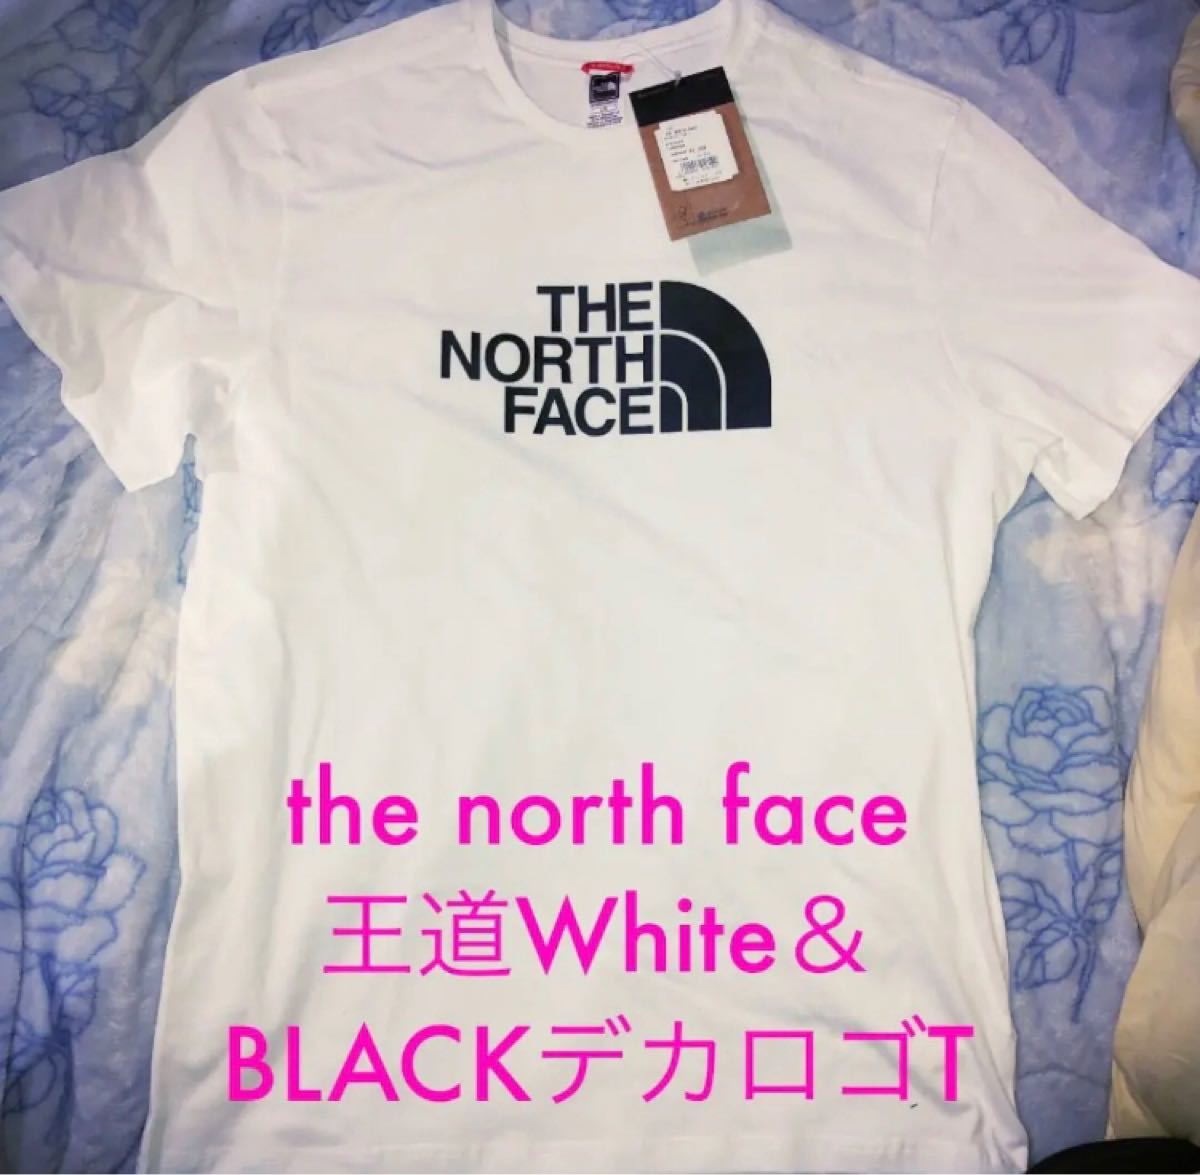 THE NORTH FACE ハーフドーム 海外限定 ザノースフェイス王道White&BLACKーデカロゴ 海外Lサイズ